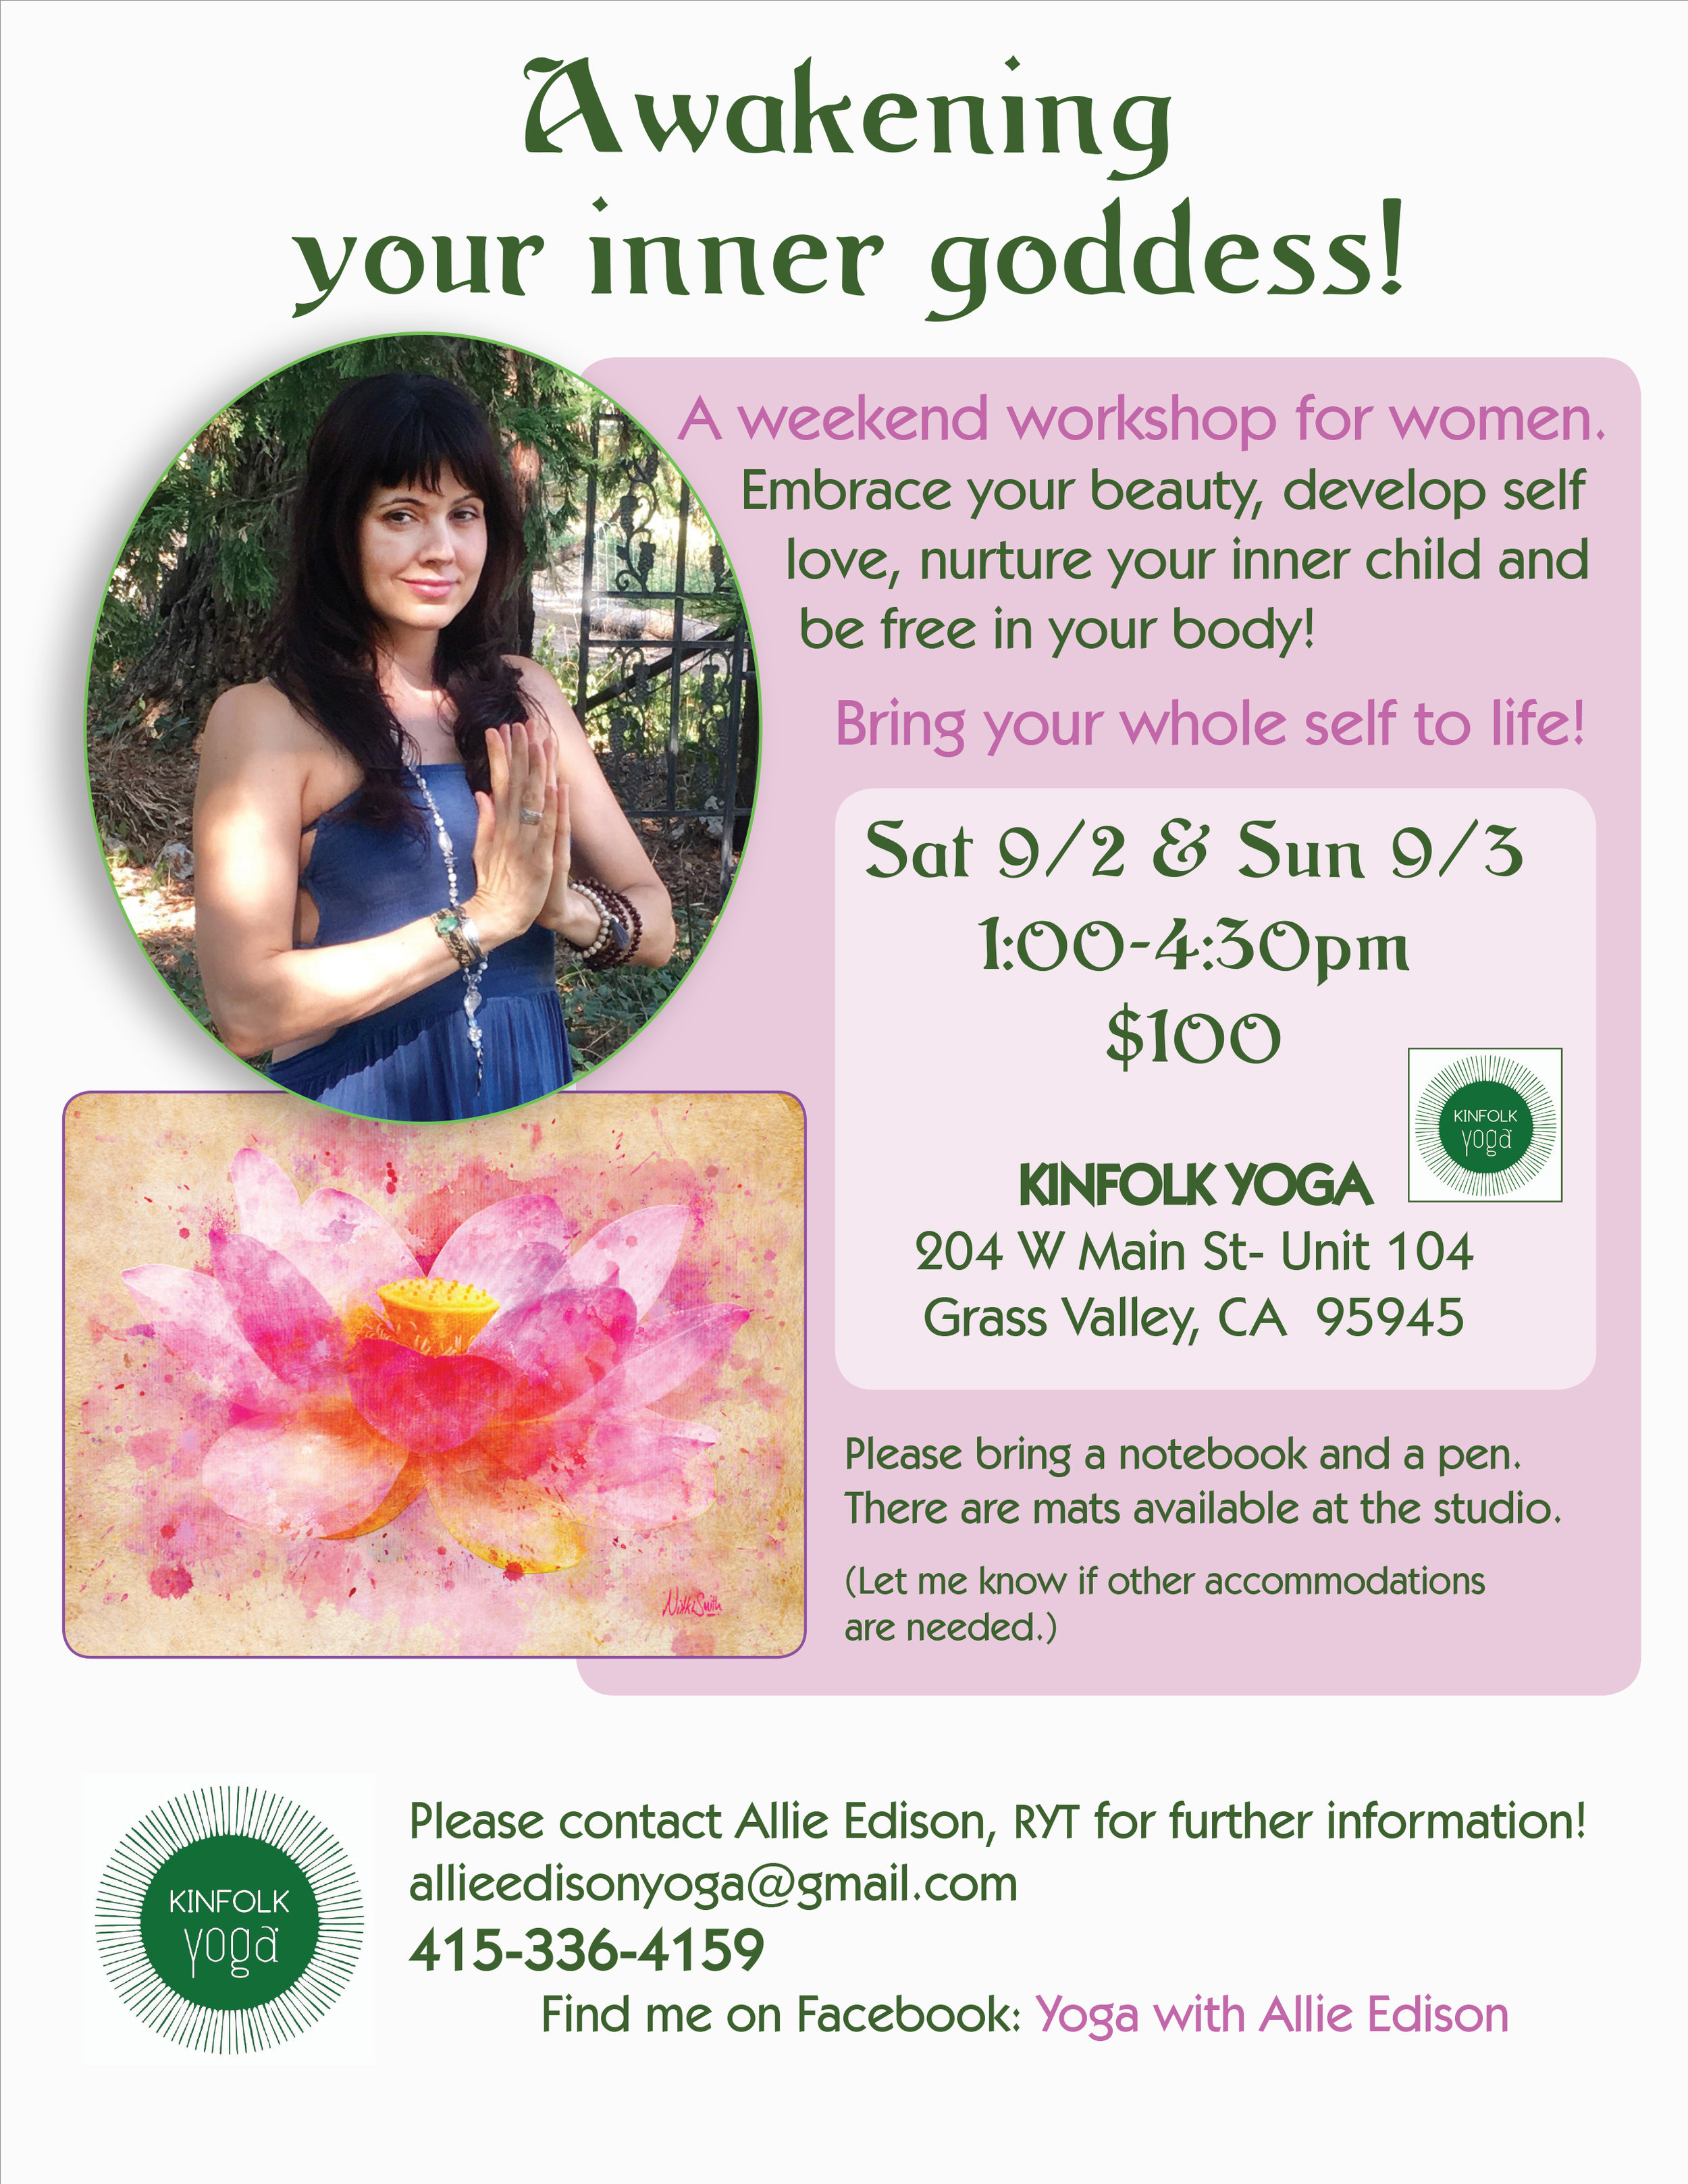 Awakening Your Inner Goddess Workshop Yoga Studio Nevada City Kinfolk Yoga